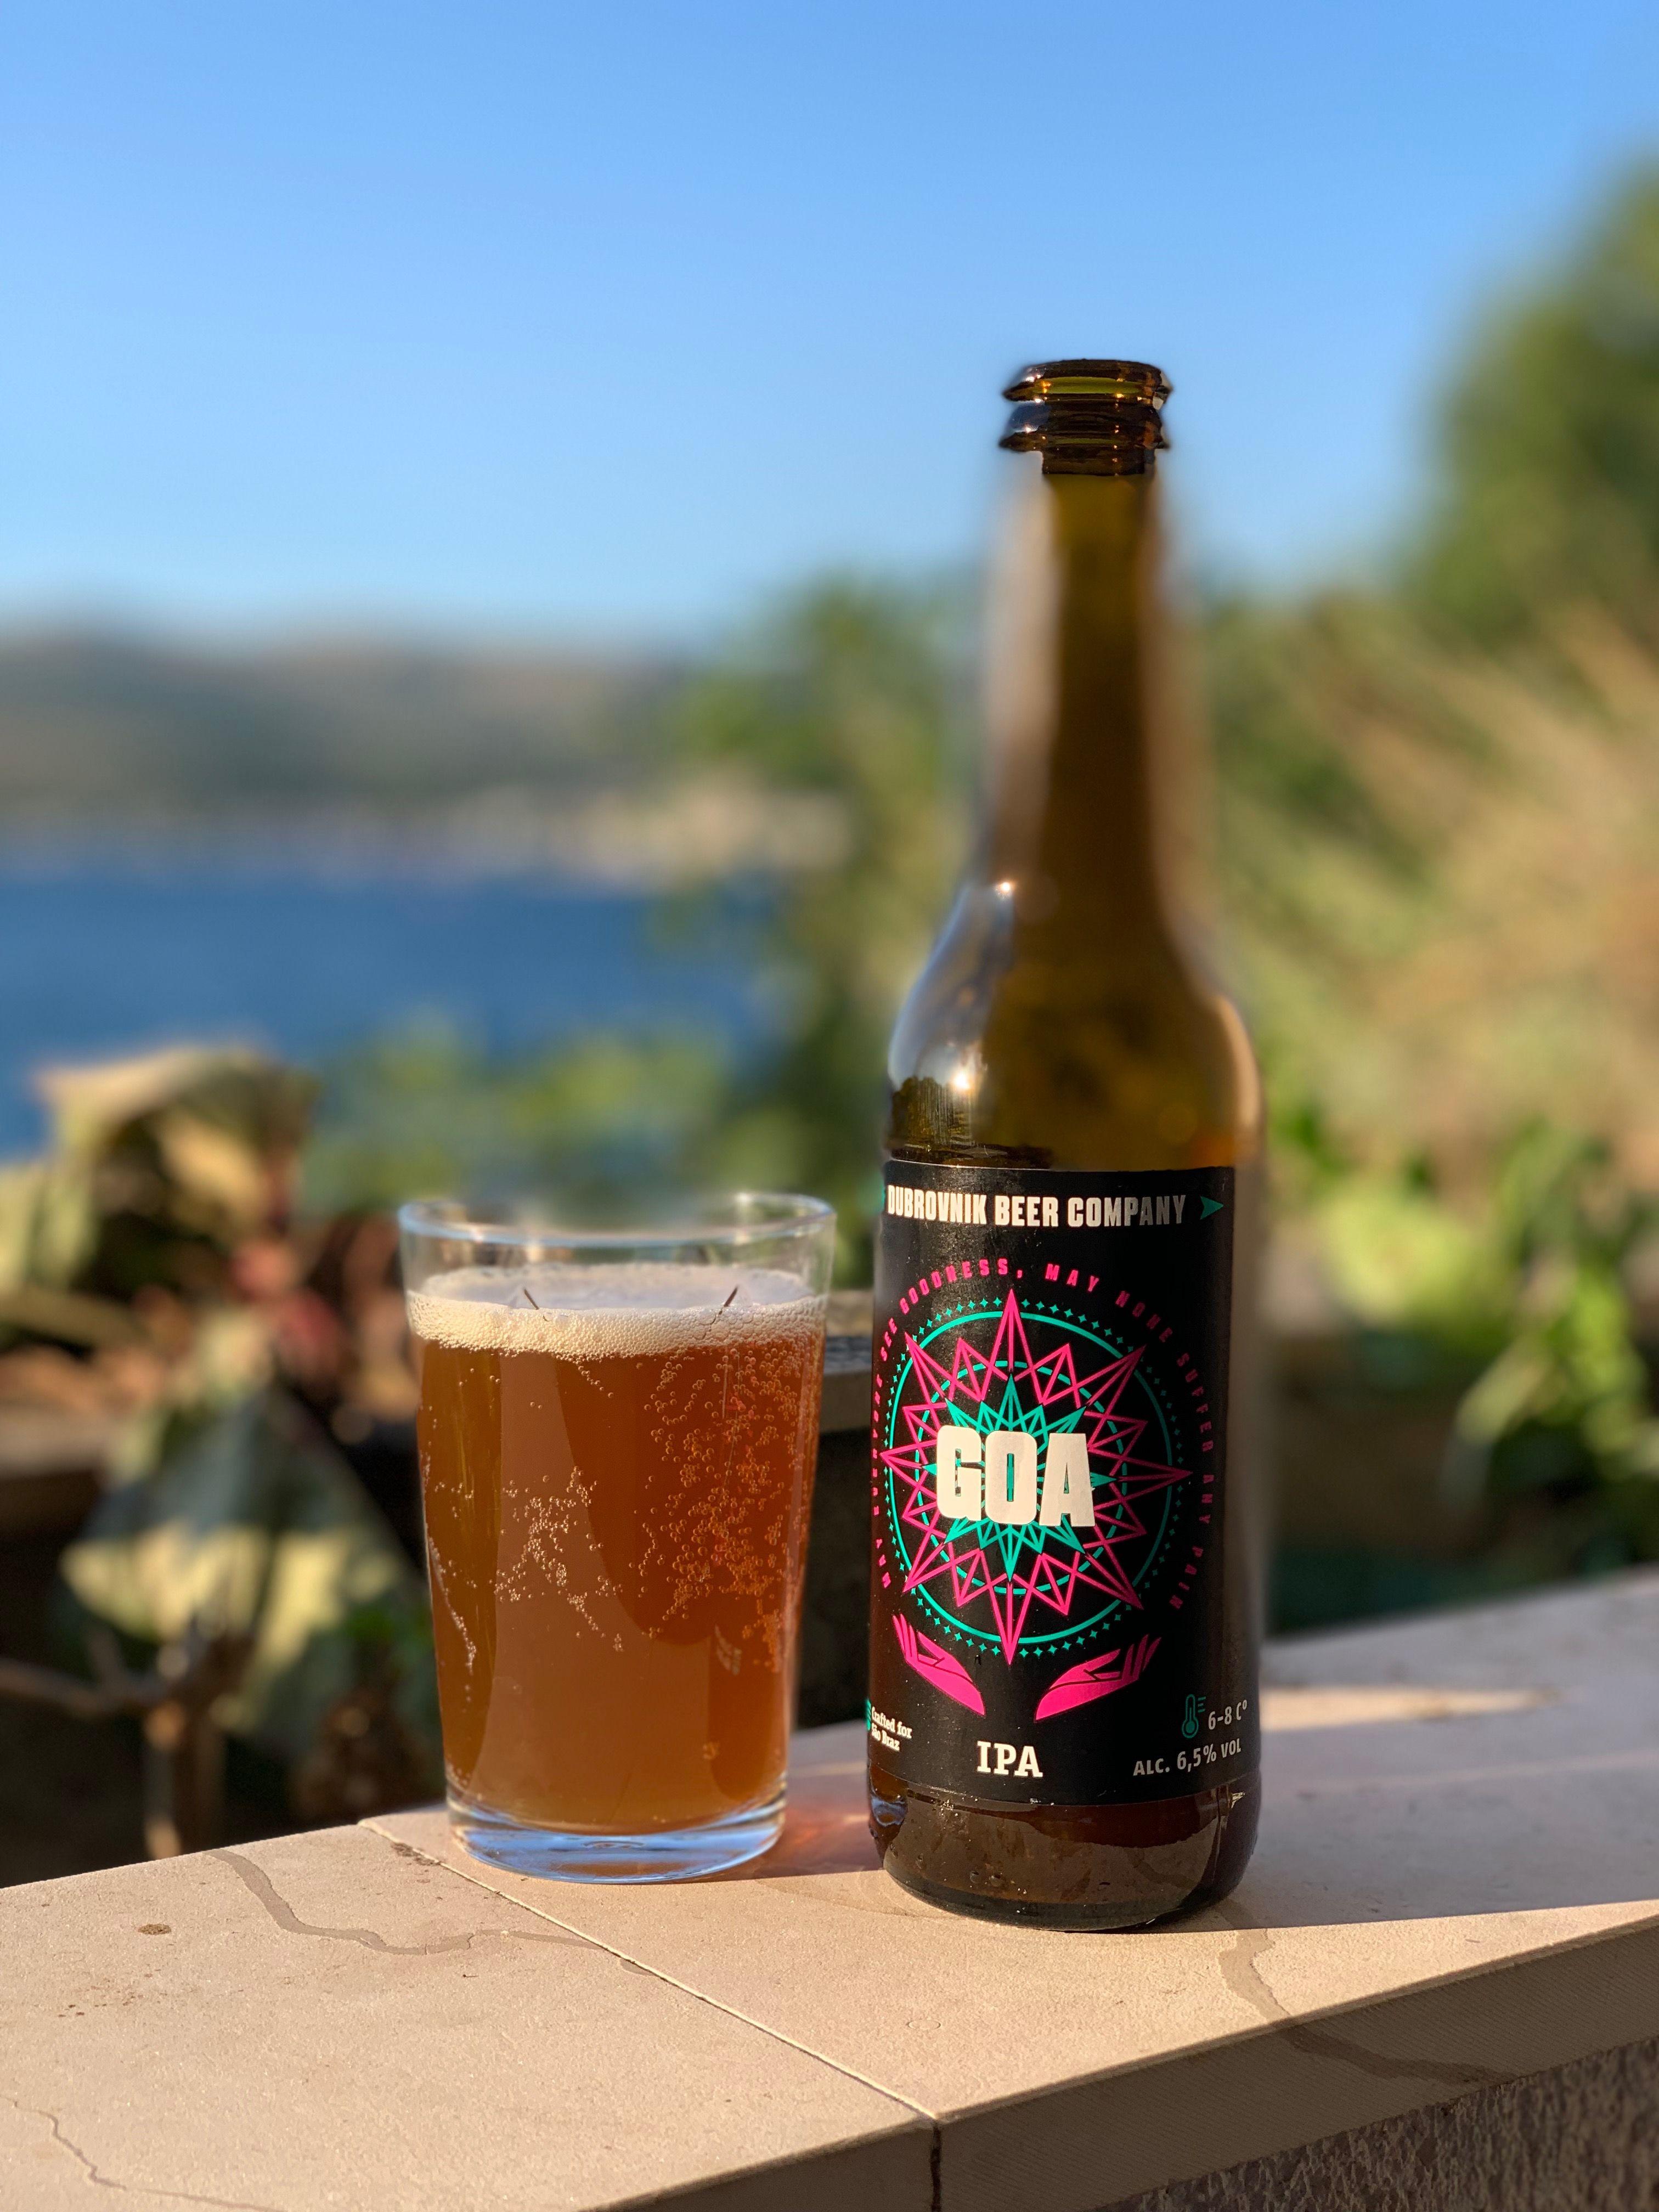 Goa ipa dubrovnik beer company 20190710 cerveja